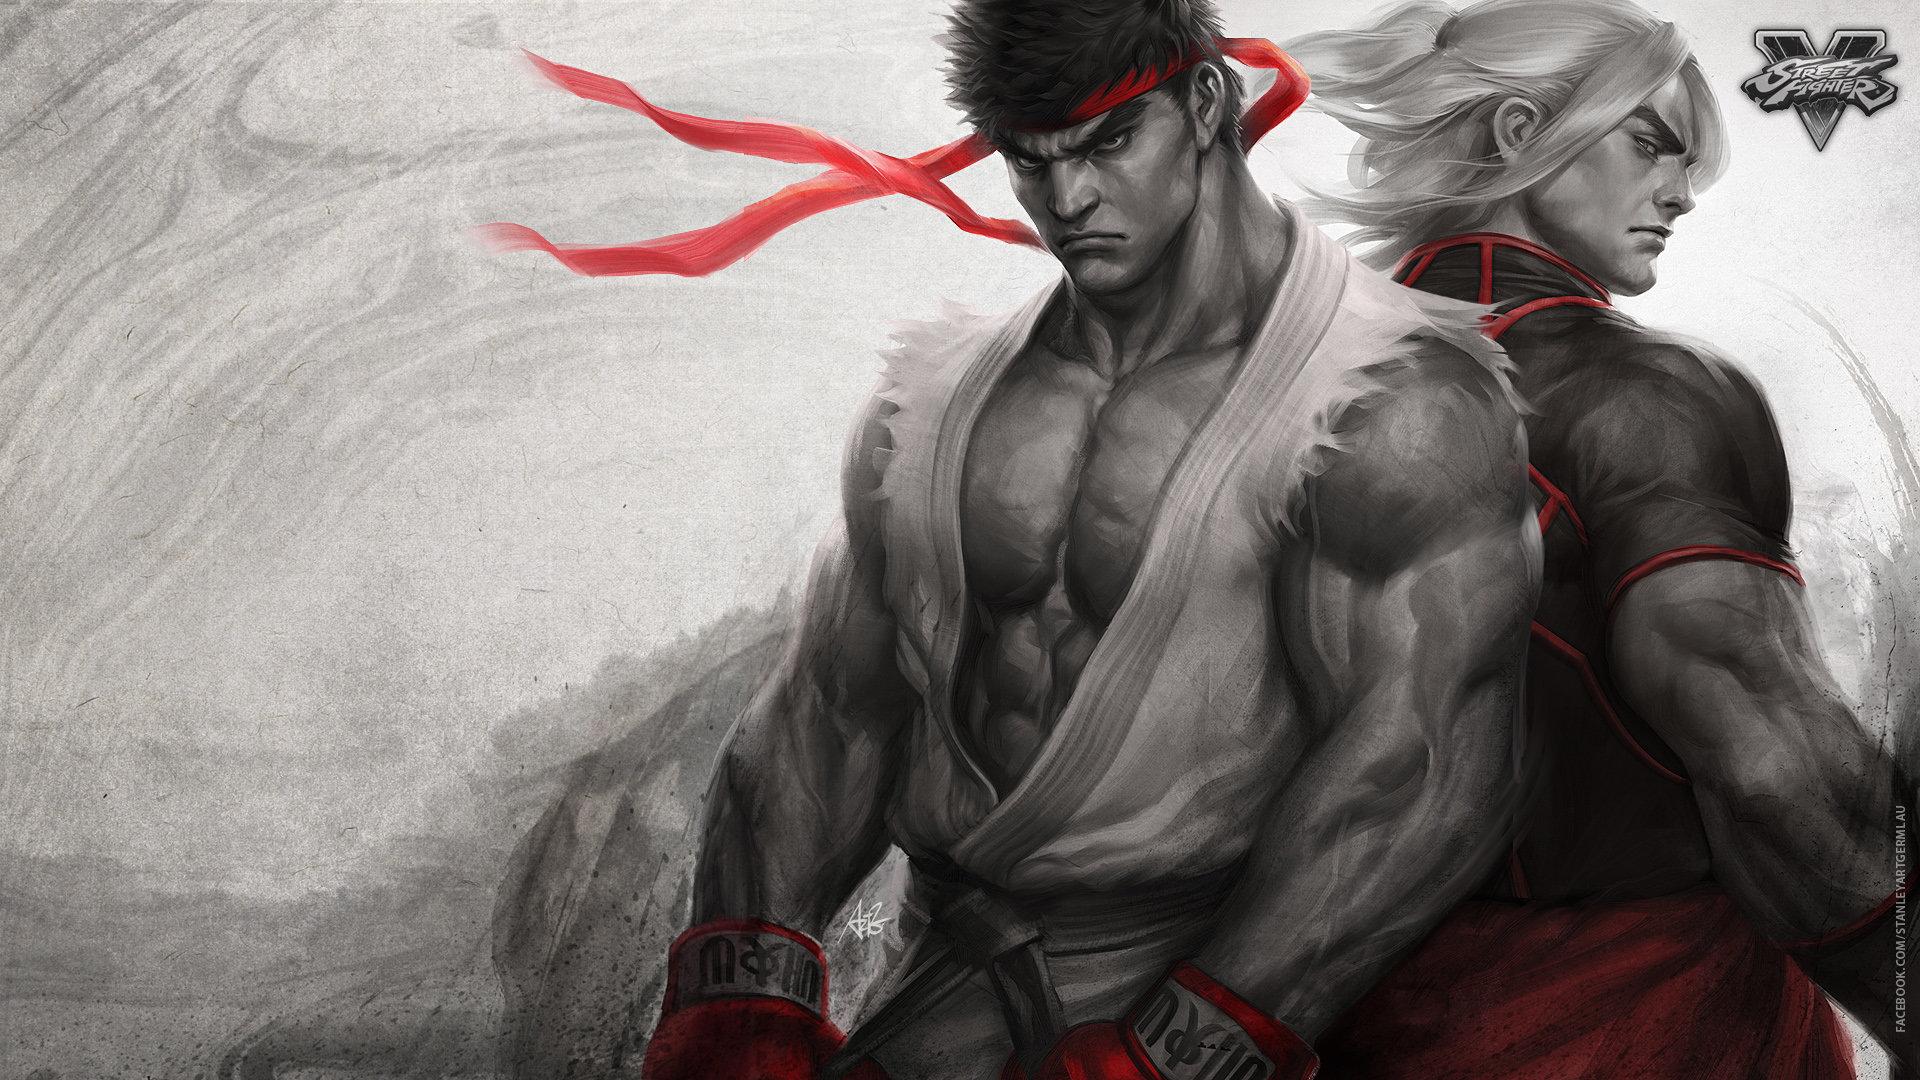 Street Fighter 5 Wallpapers Hd For Desktop Backgrounds